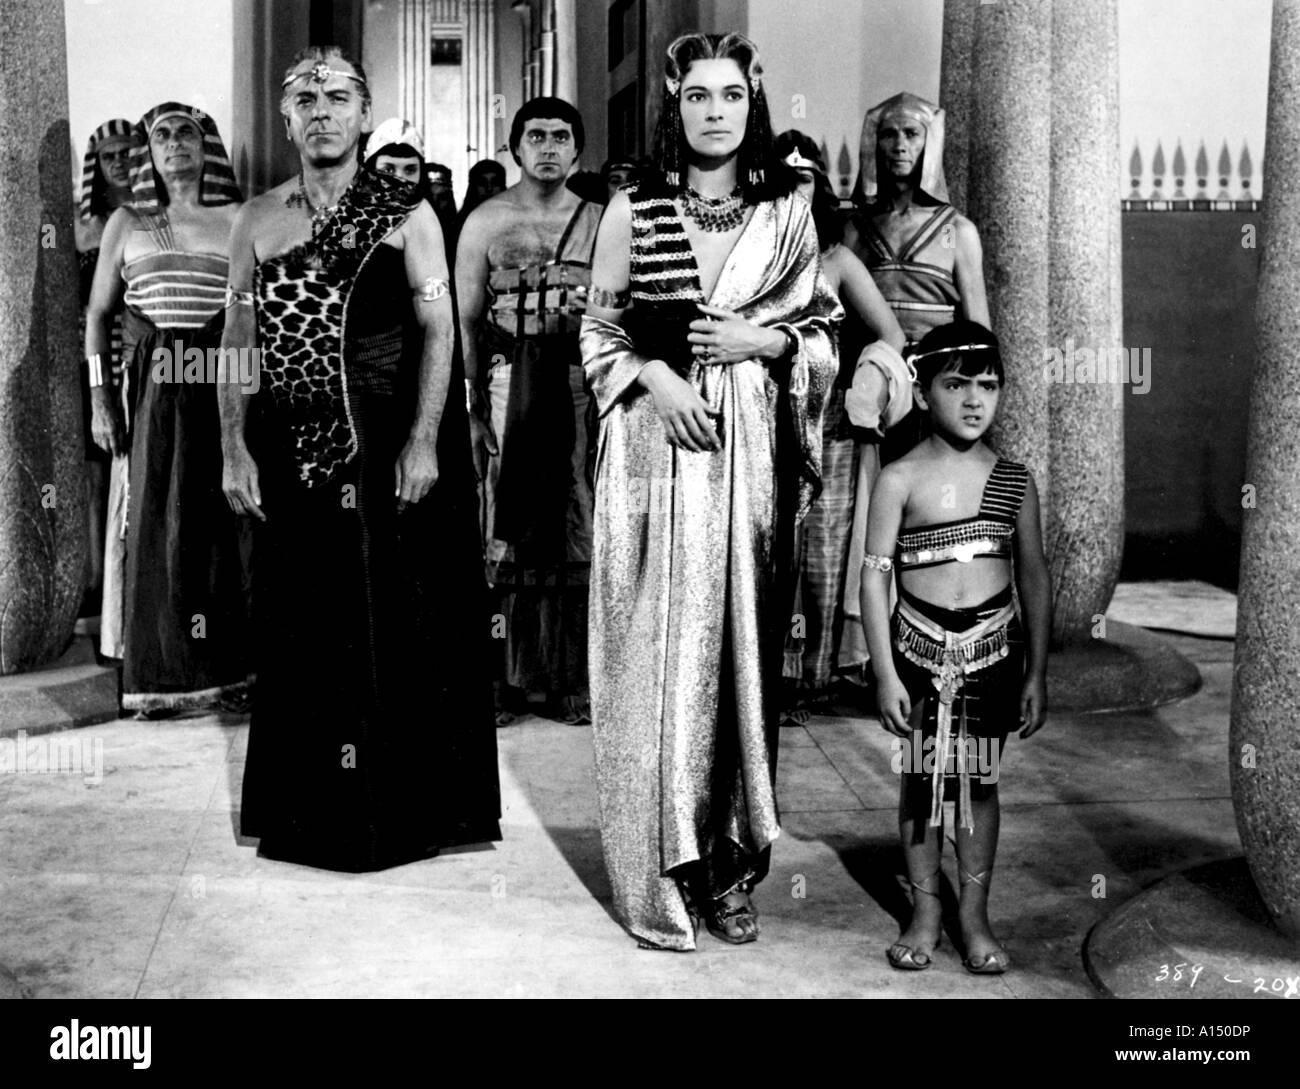 Land Of The Pharaons Year 1955 Director Howard Hawks James Robertson Justice Kerima - Stock Image